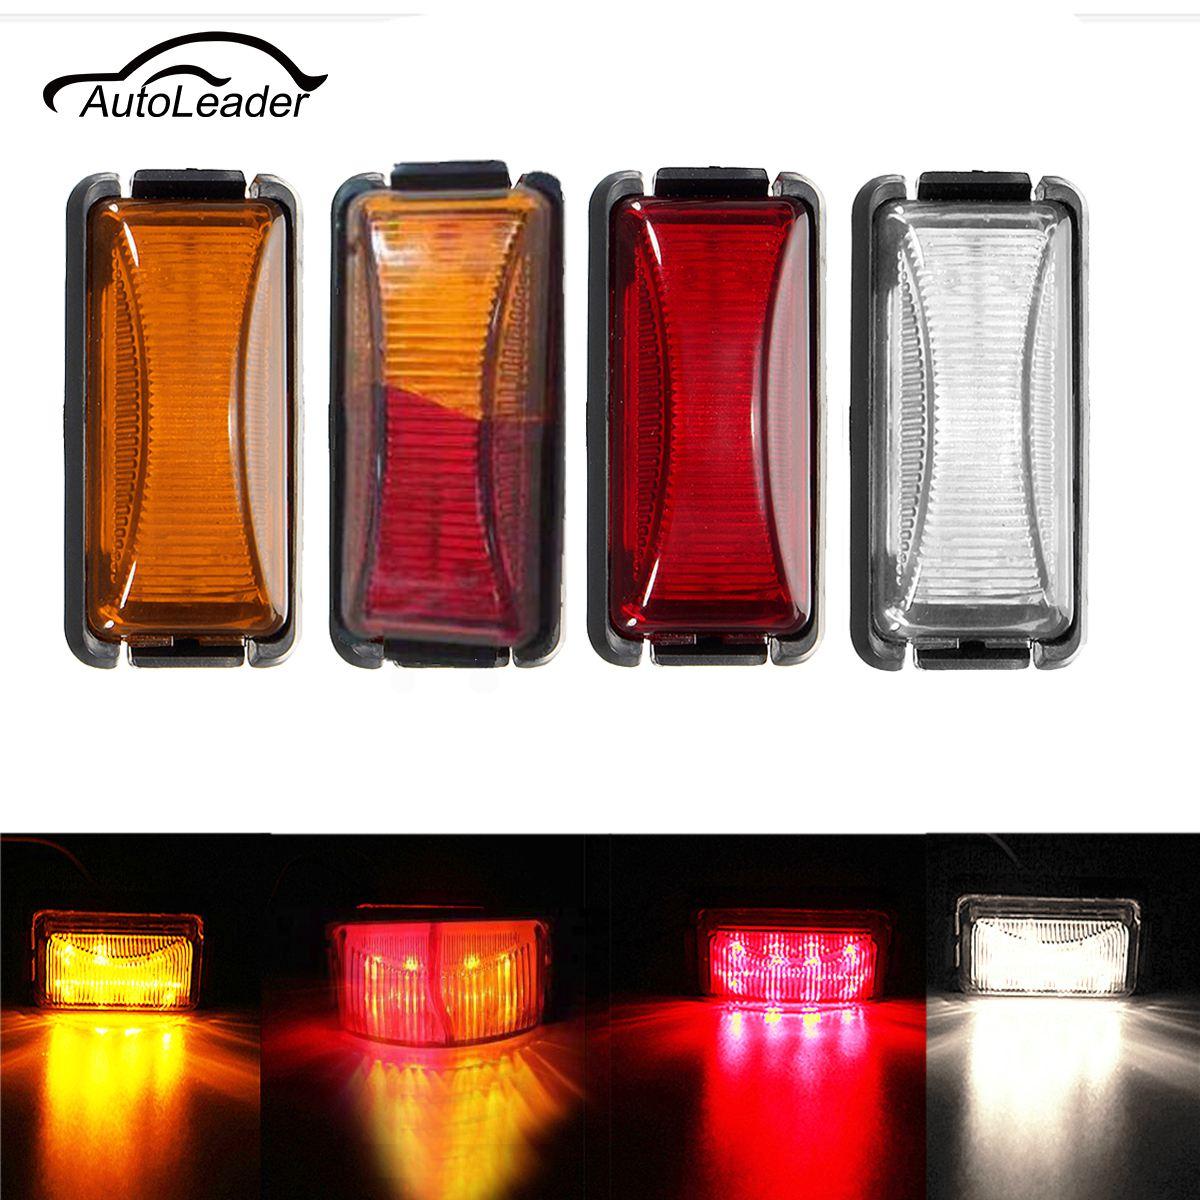 1Pc  12V 8 LED Trailer Tail Light Side Marker Indicators Lights Clearance Signal Light For Truck Van Boat